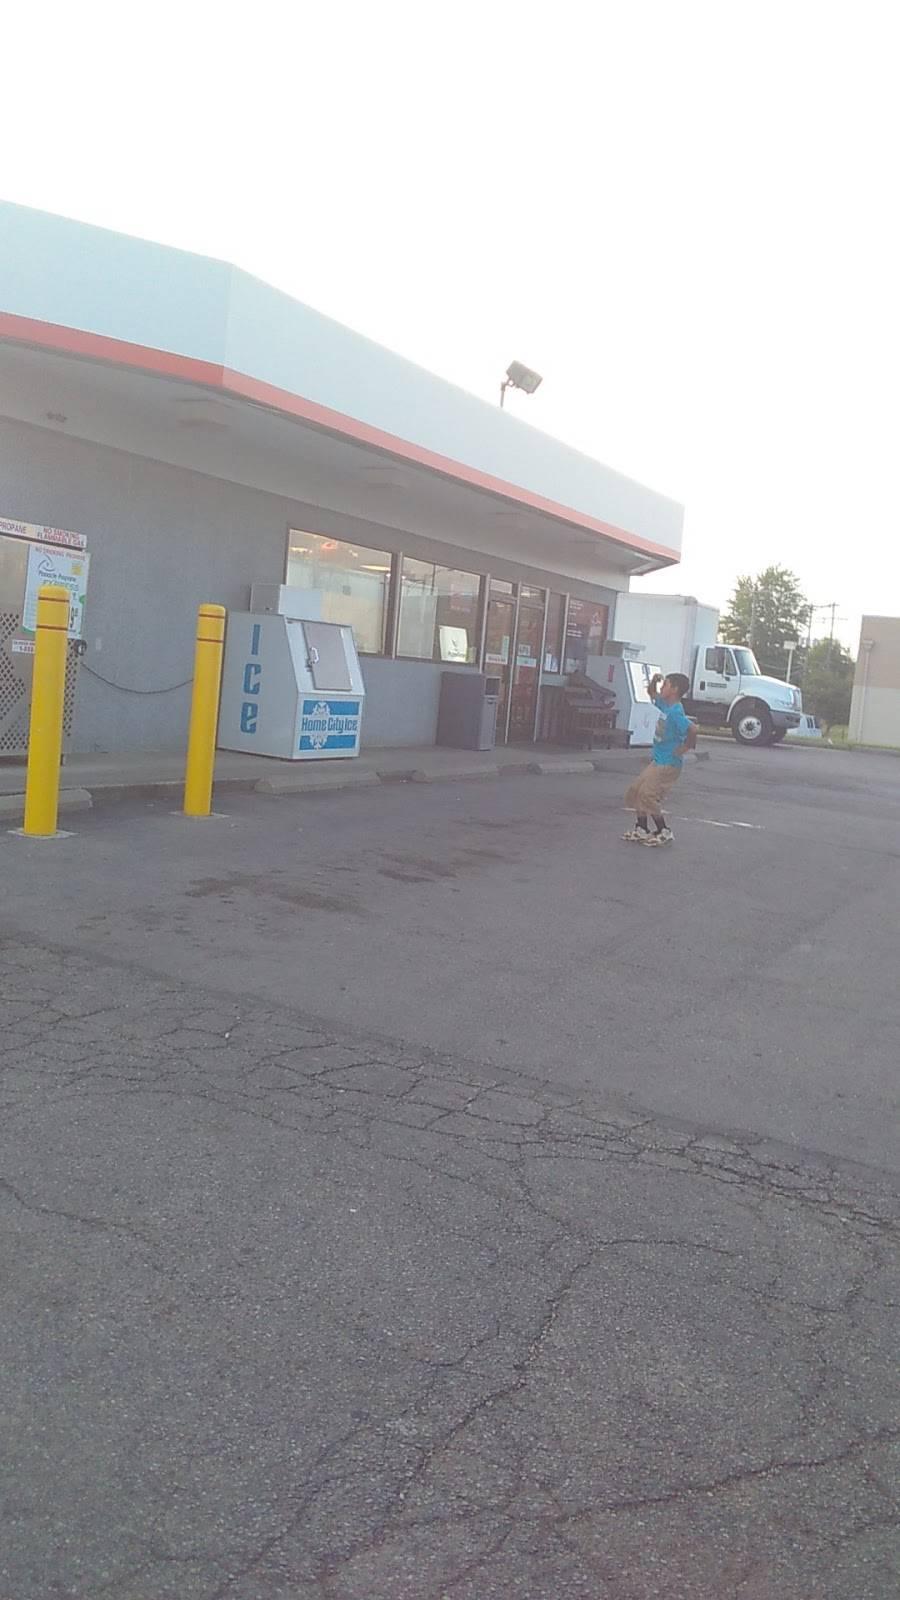 Shell - gas station  | Photo 2 of 2 | Address: 4425 Alum Creek Dr, Obetz, OH 43207, USA | Phone: (614) 497-2262